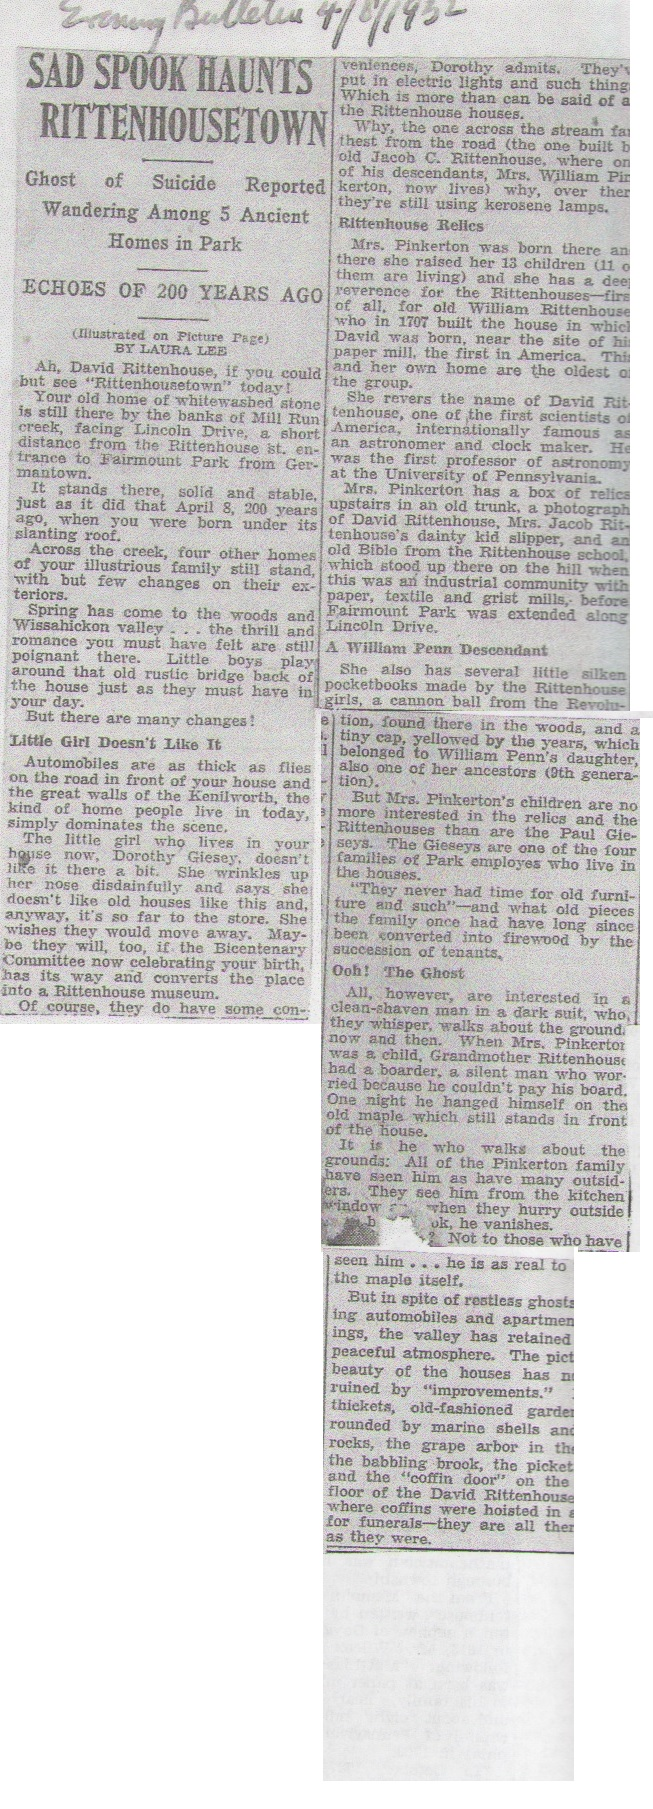 Chadwick Spooks Haunt Rittenhouse Town Evening Bulletin 4-8-1932